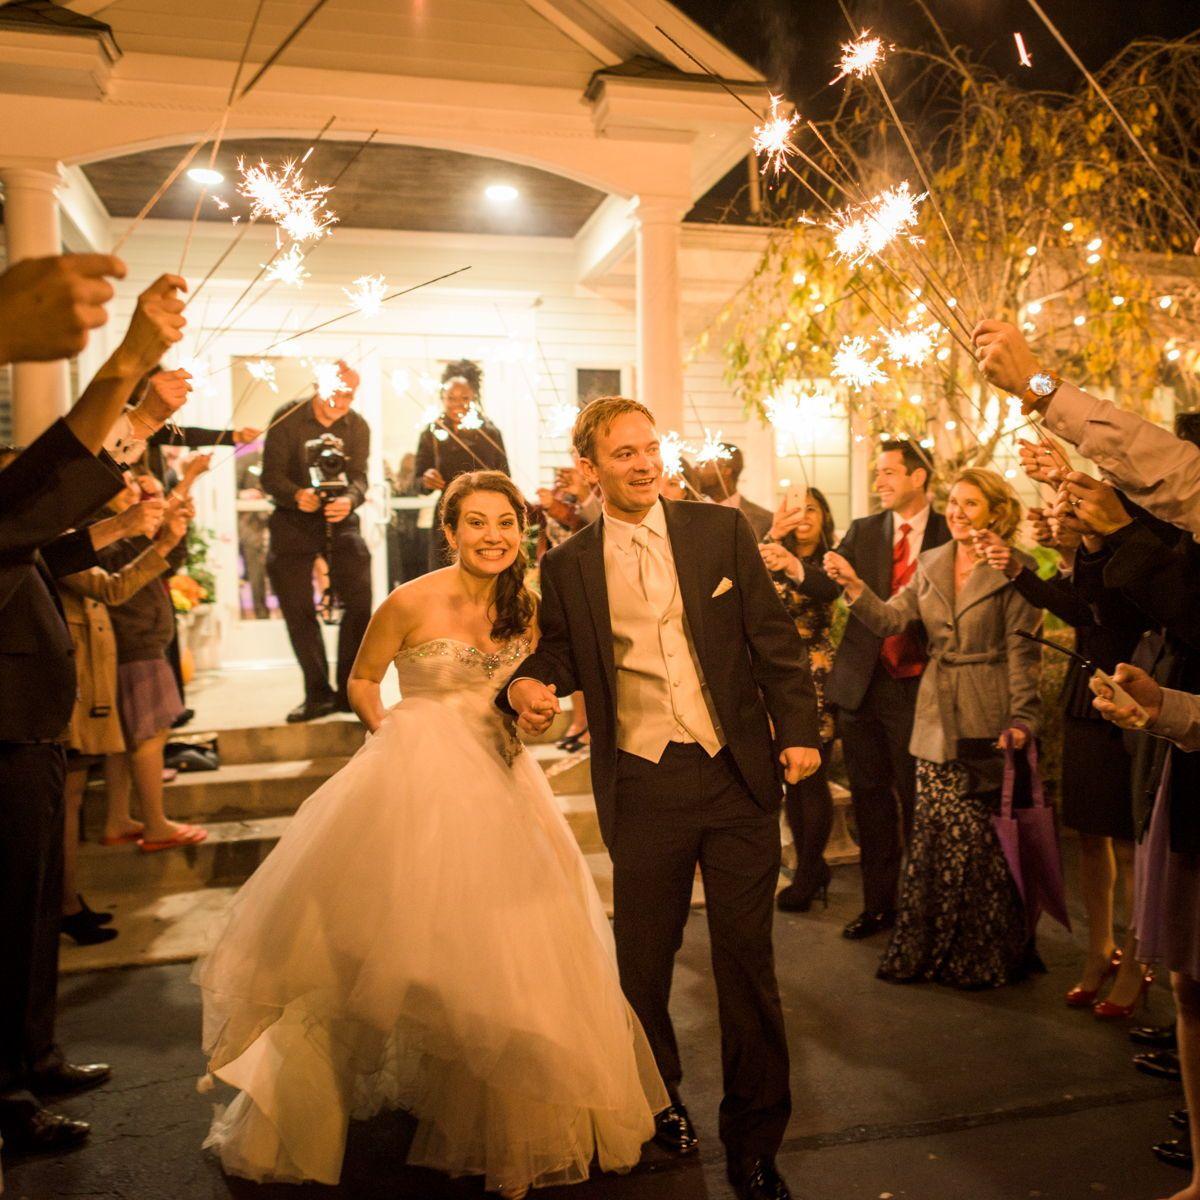 Another Happy Wedding Sparkler Exit Wedding Sparklers Sparkler Exit Wedding Instyle Weddings